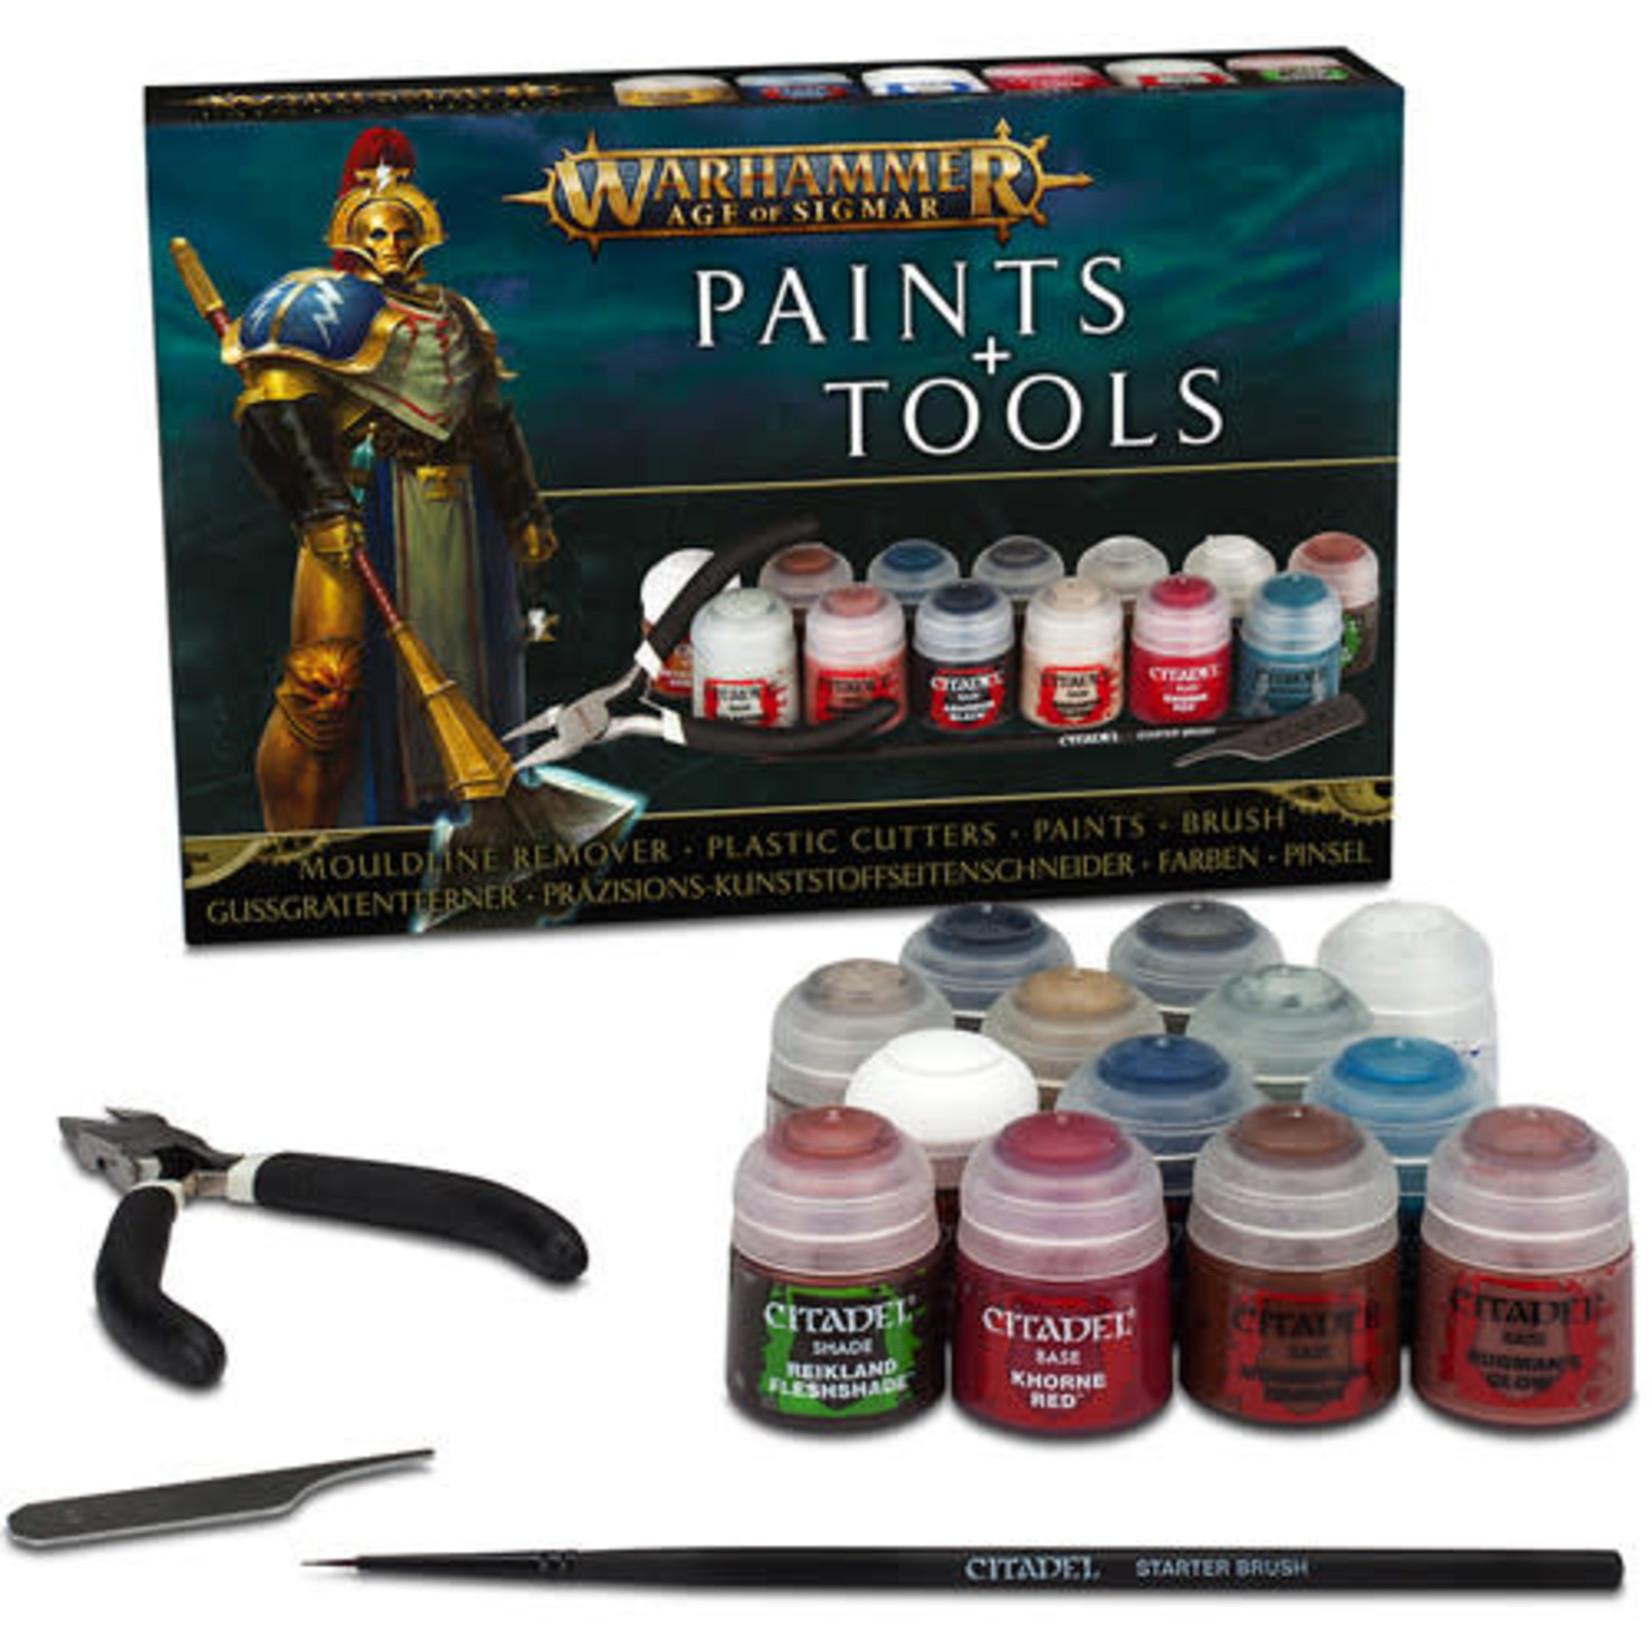 Citadel Warhammer Age of Sigmar: Paints & Tools